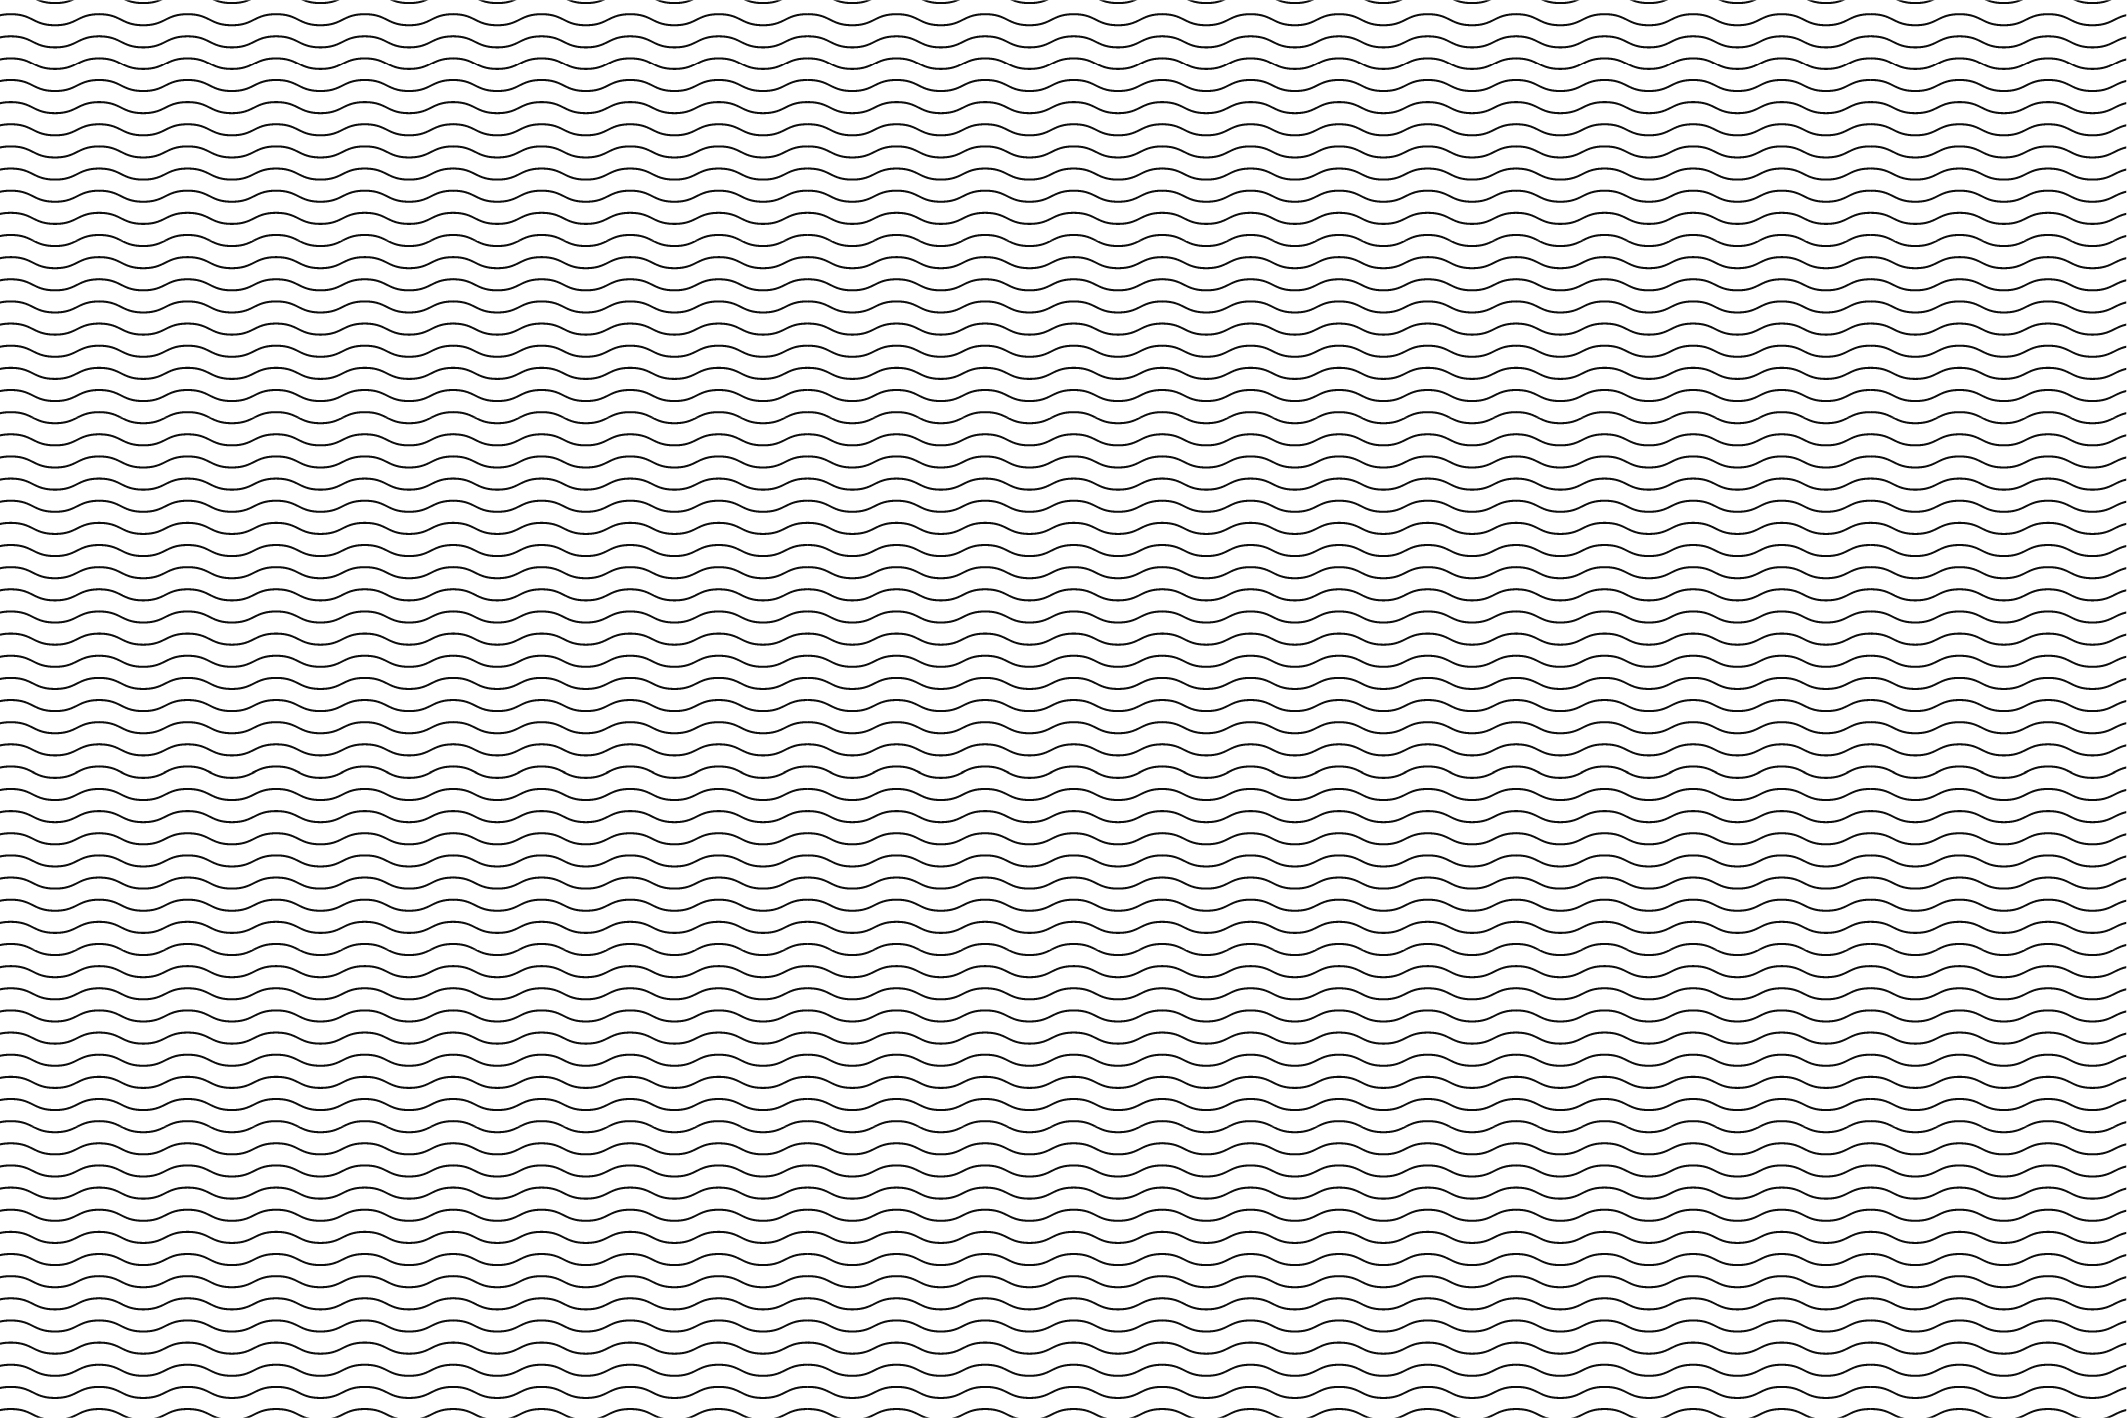 Wave&Zigzag seamless patterns. B&W. example image 5